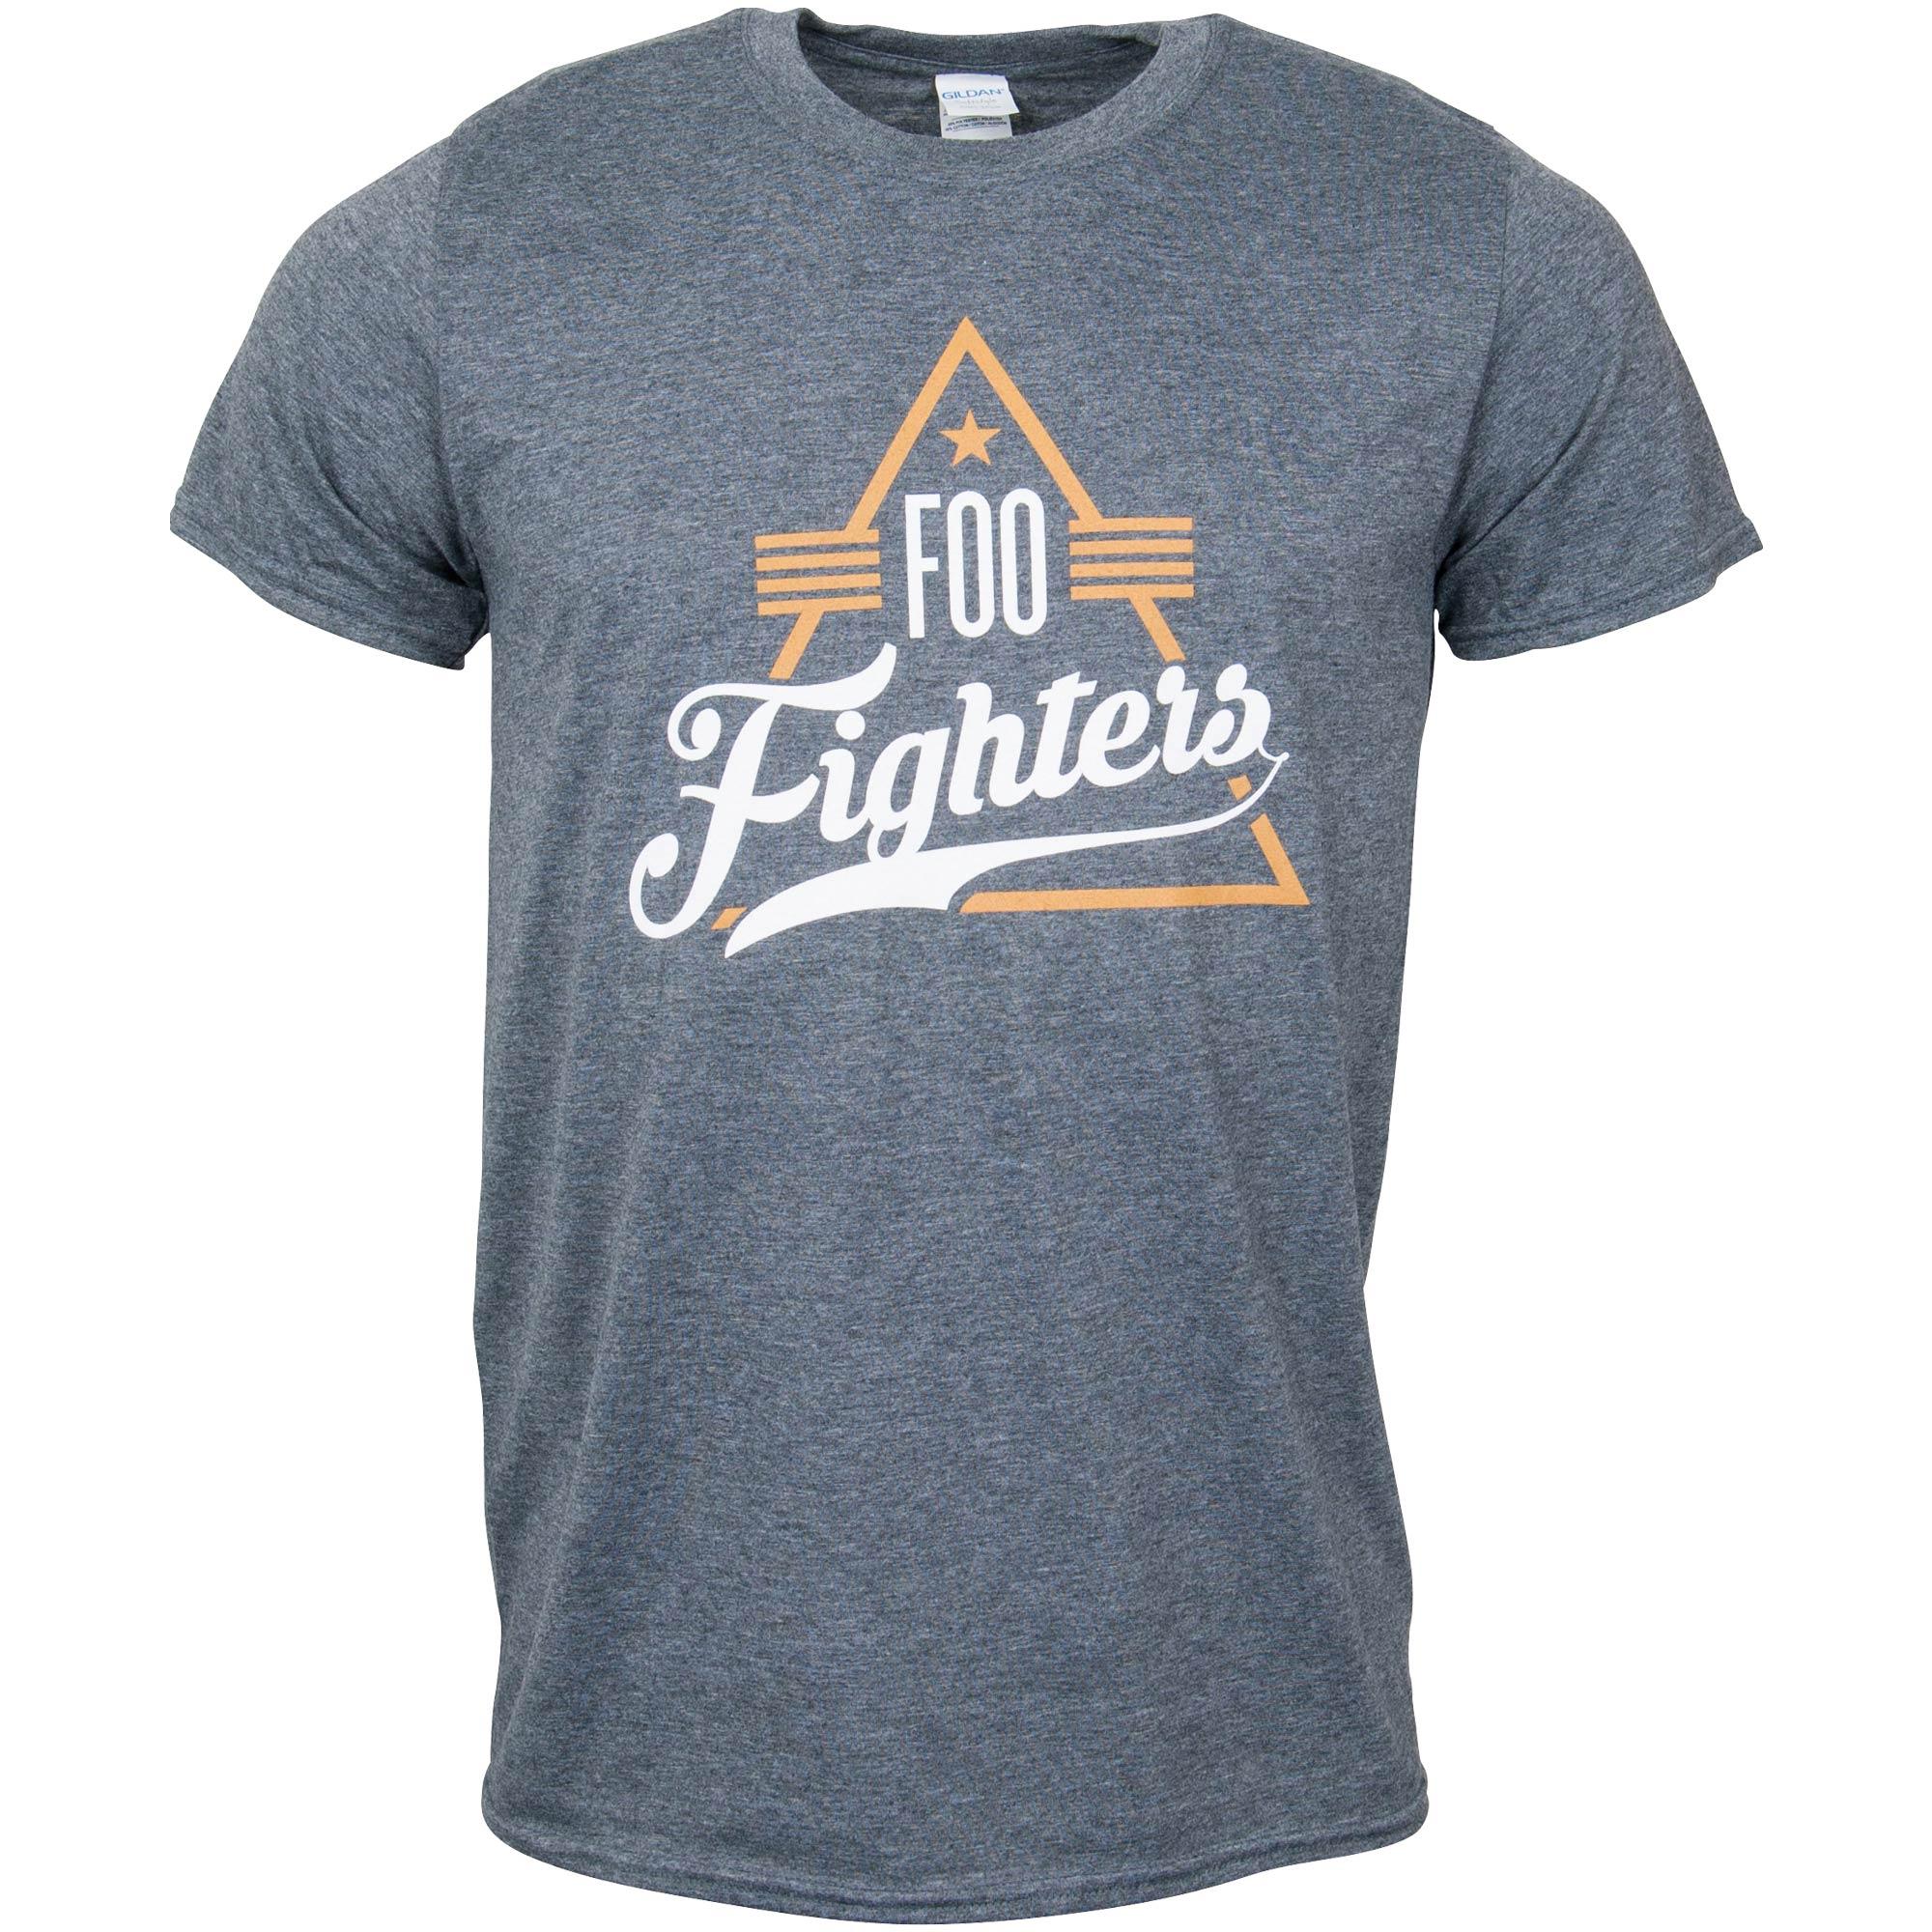 Foo Fighters - T-Shirt Triangle - grau